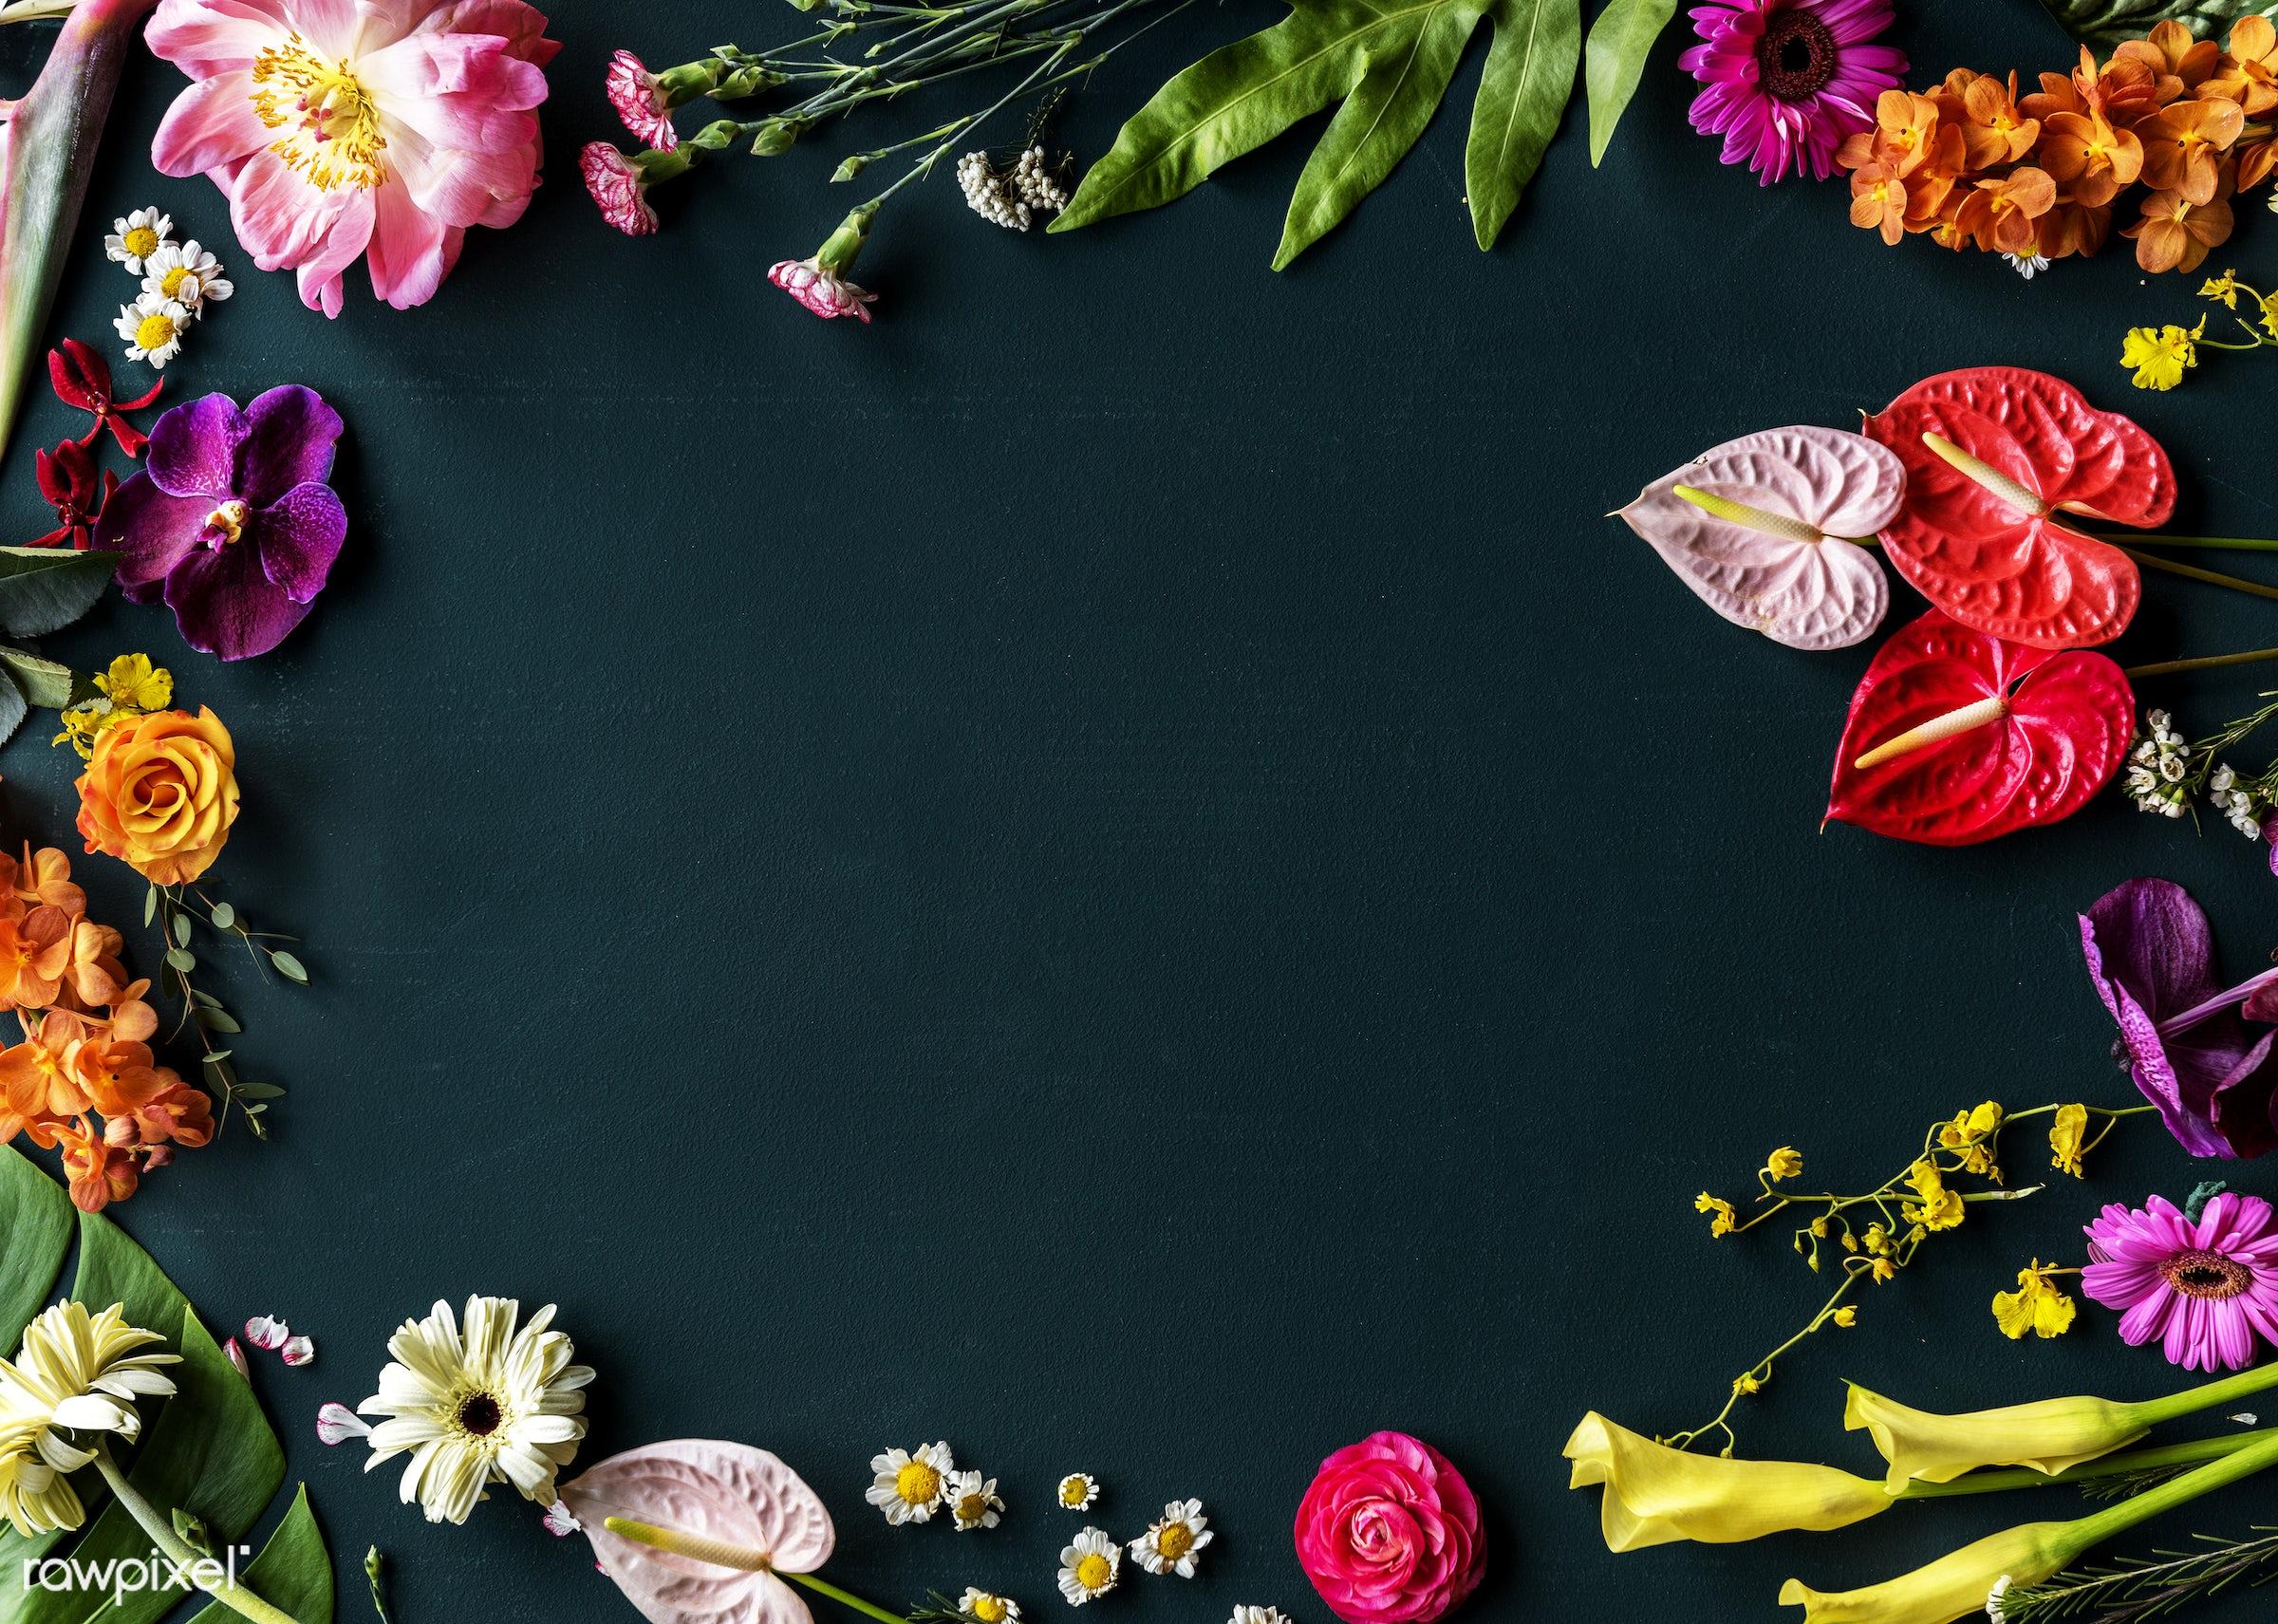 Colorful flowers on black background - plant, bouquet, concept, decorative, botany, leaf, botanical, leaves, romance, spring...